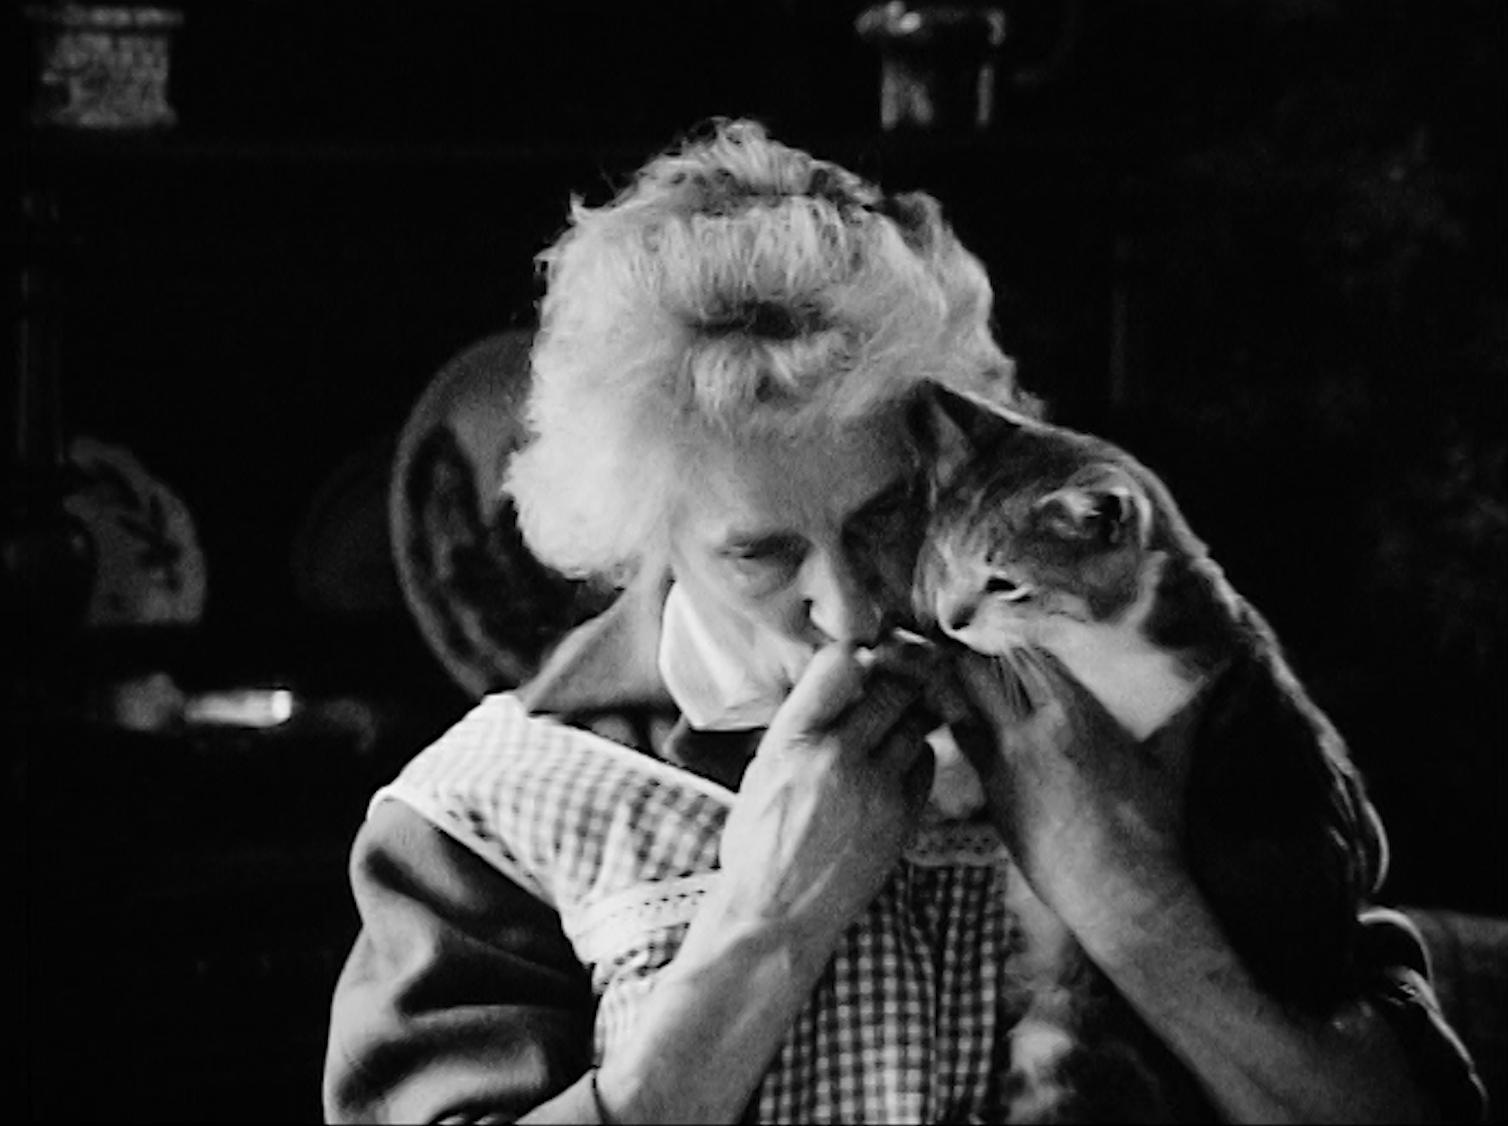 La dame aux chats